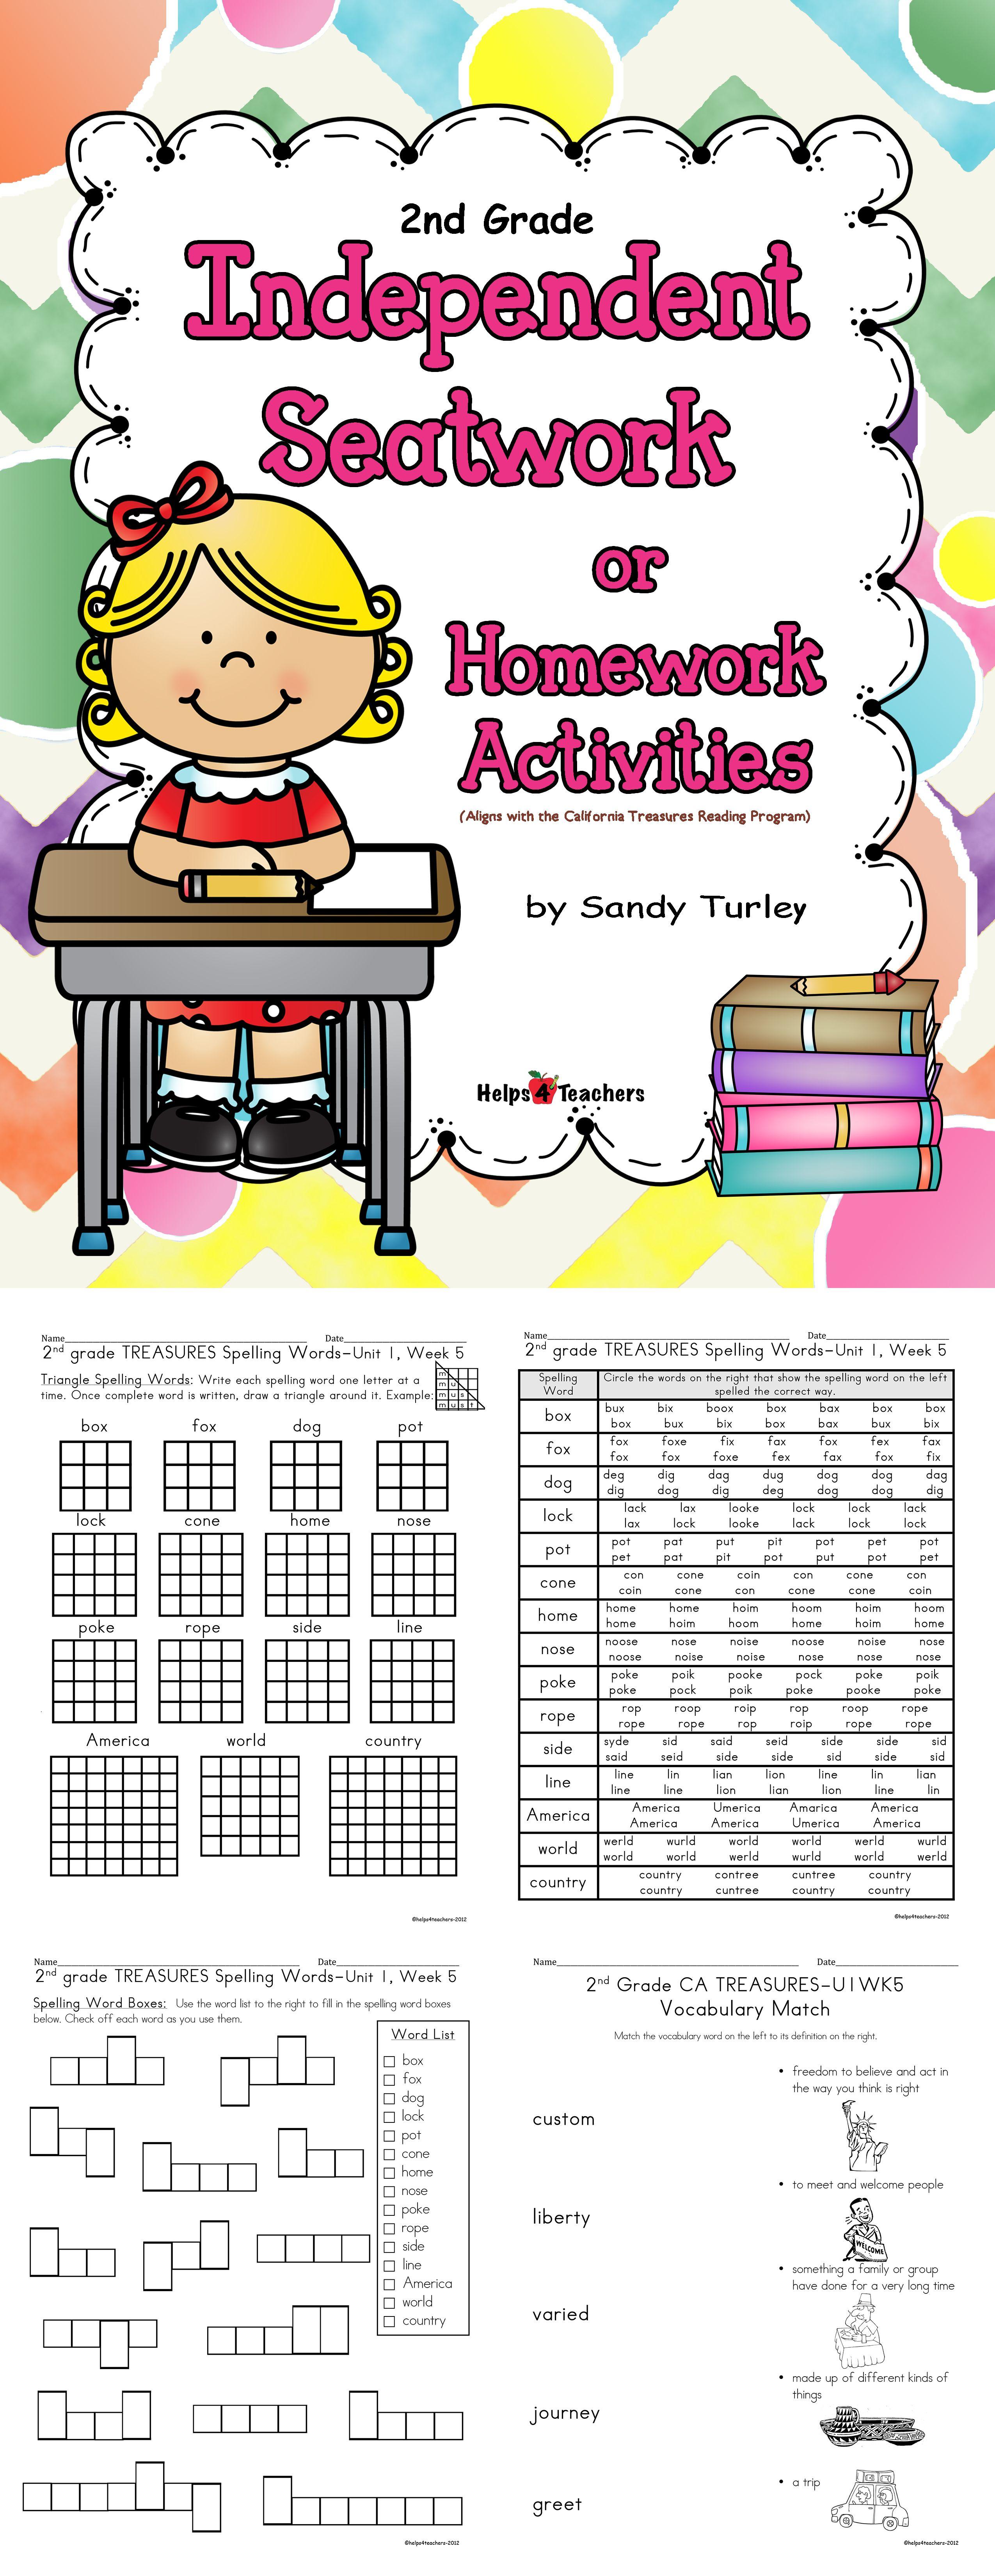 Spelling of greet choice image greetings card design simple spelling of greet choice image greetings card design simple m4hsunfo